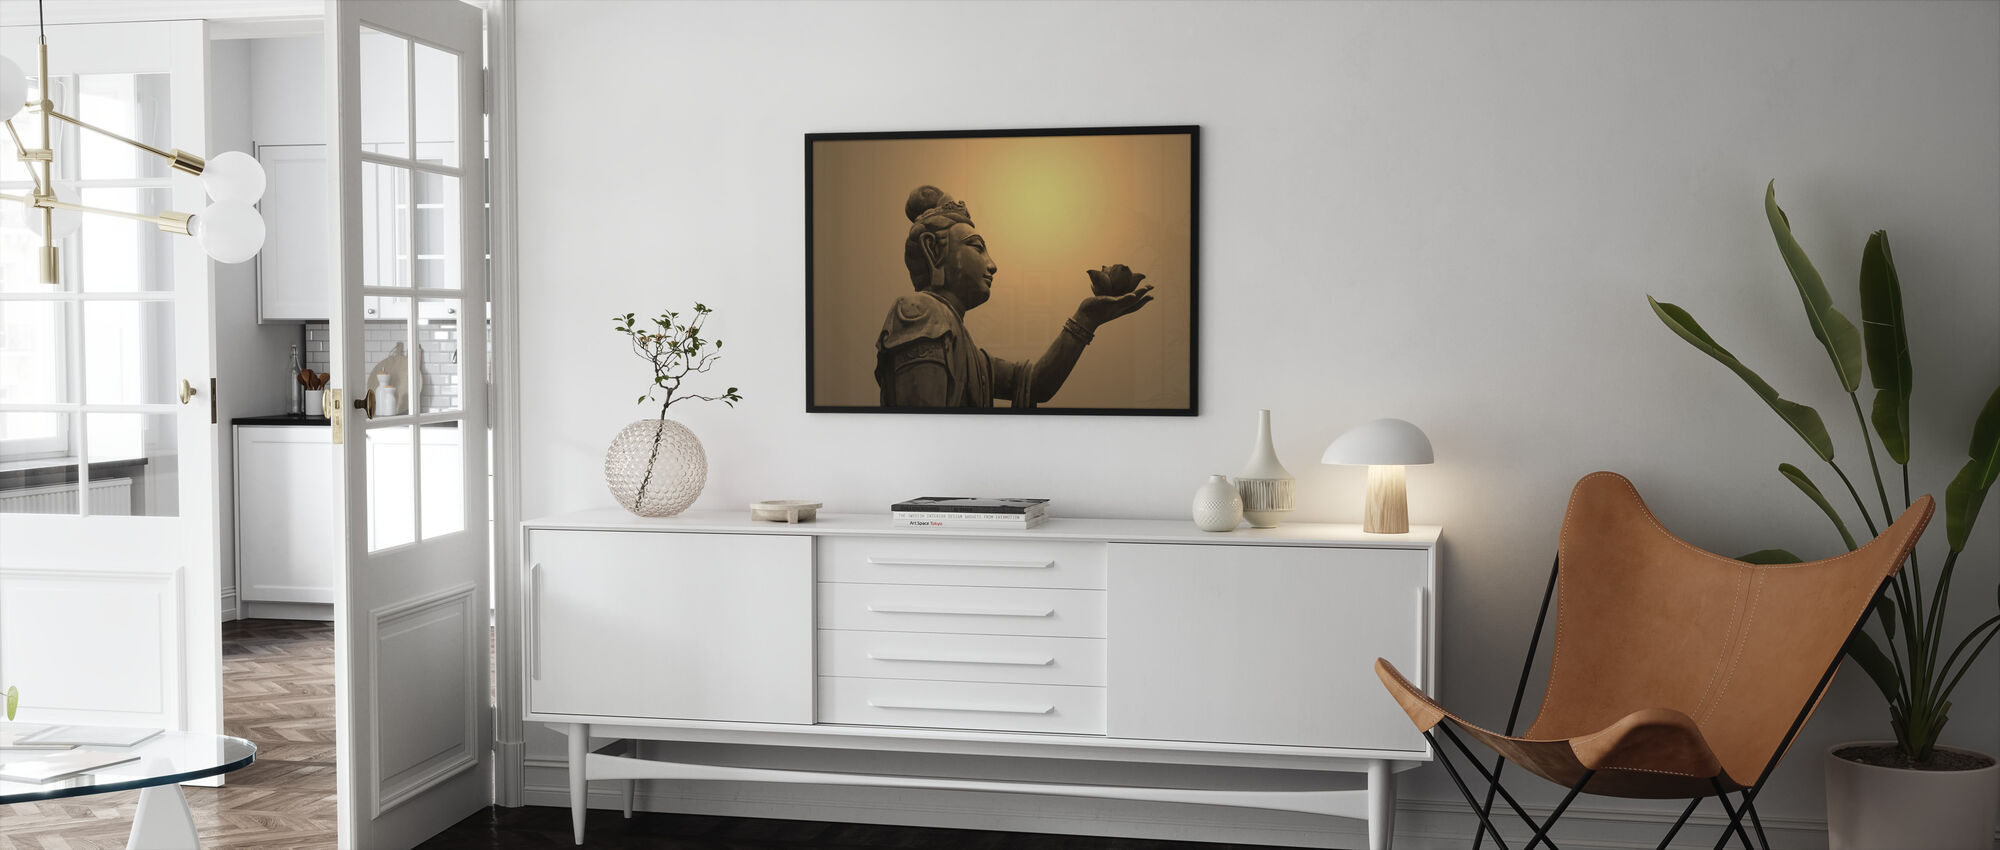 Buddhist Statue, Hong Kong - Framed print - Living Room